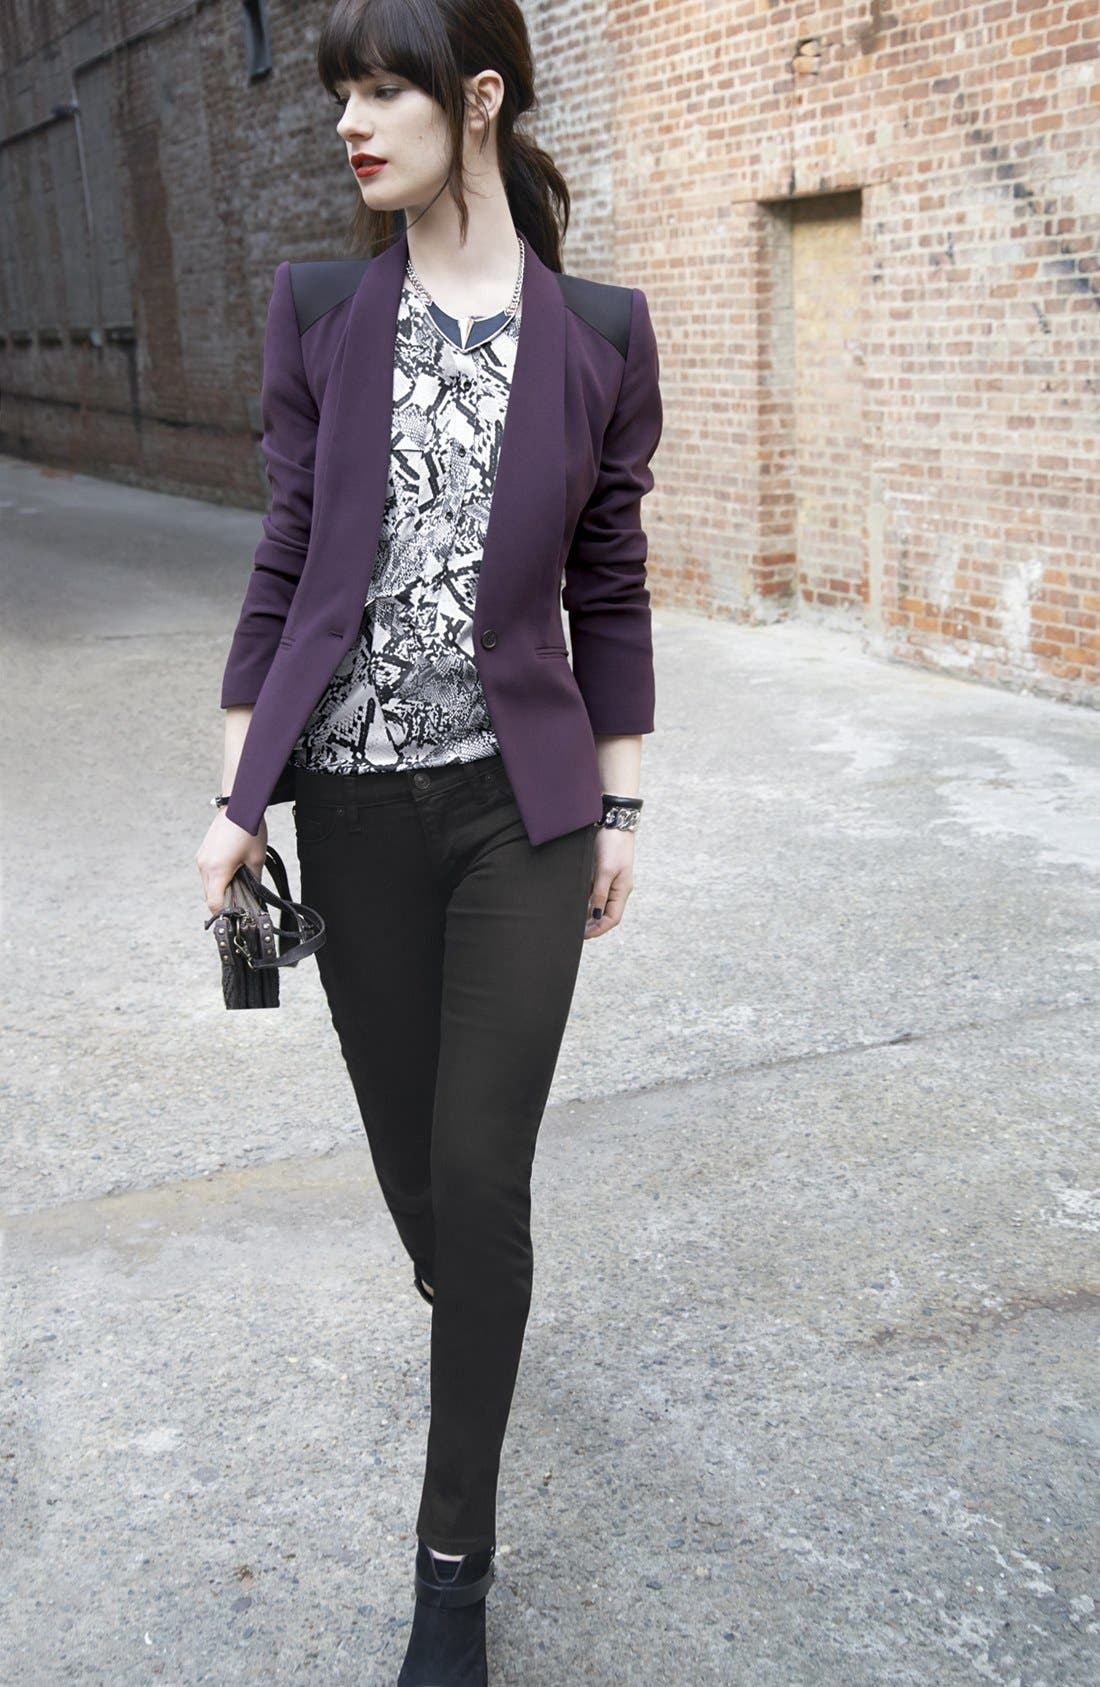 Main Image - Trouvé Blazer, Blouse & Hudson Jeans Skinny Jeans